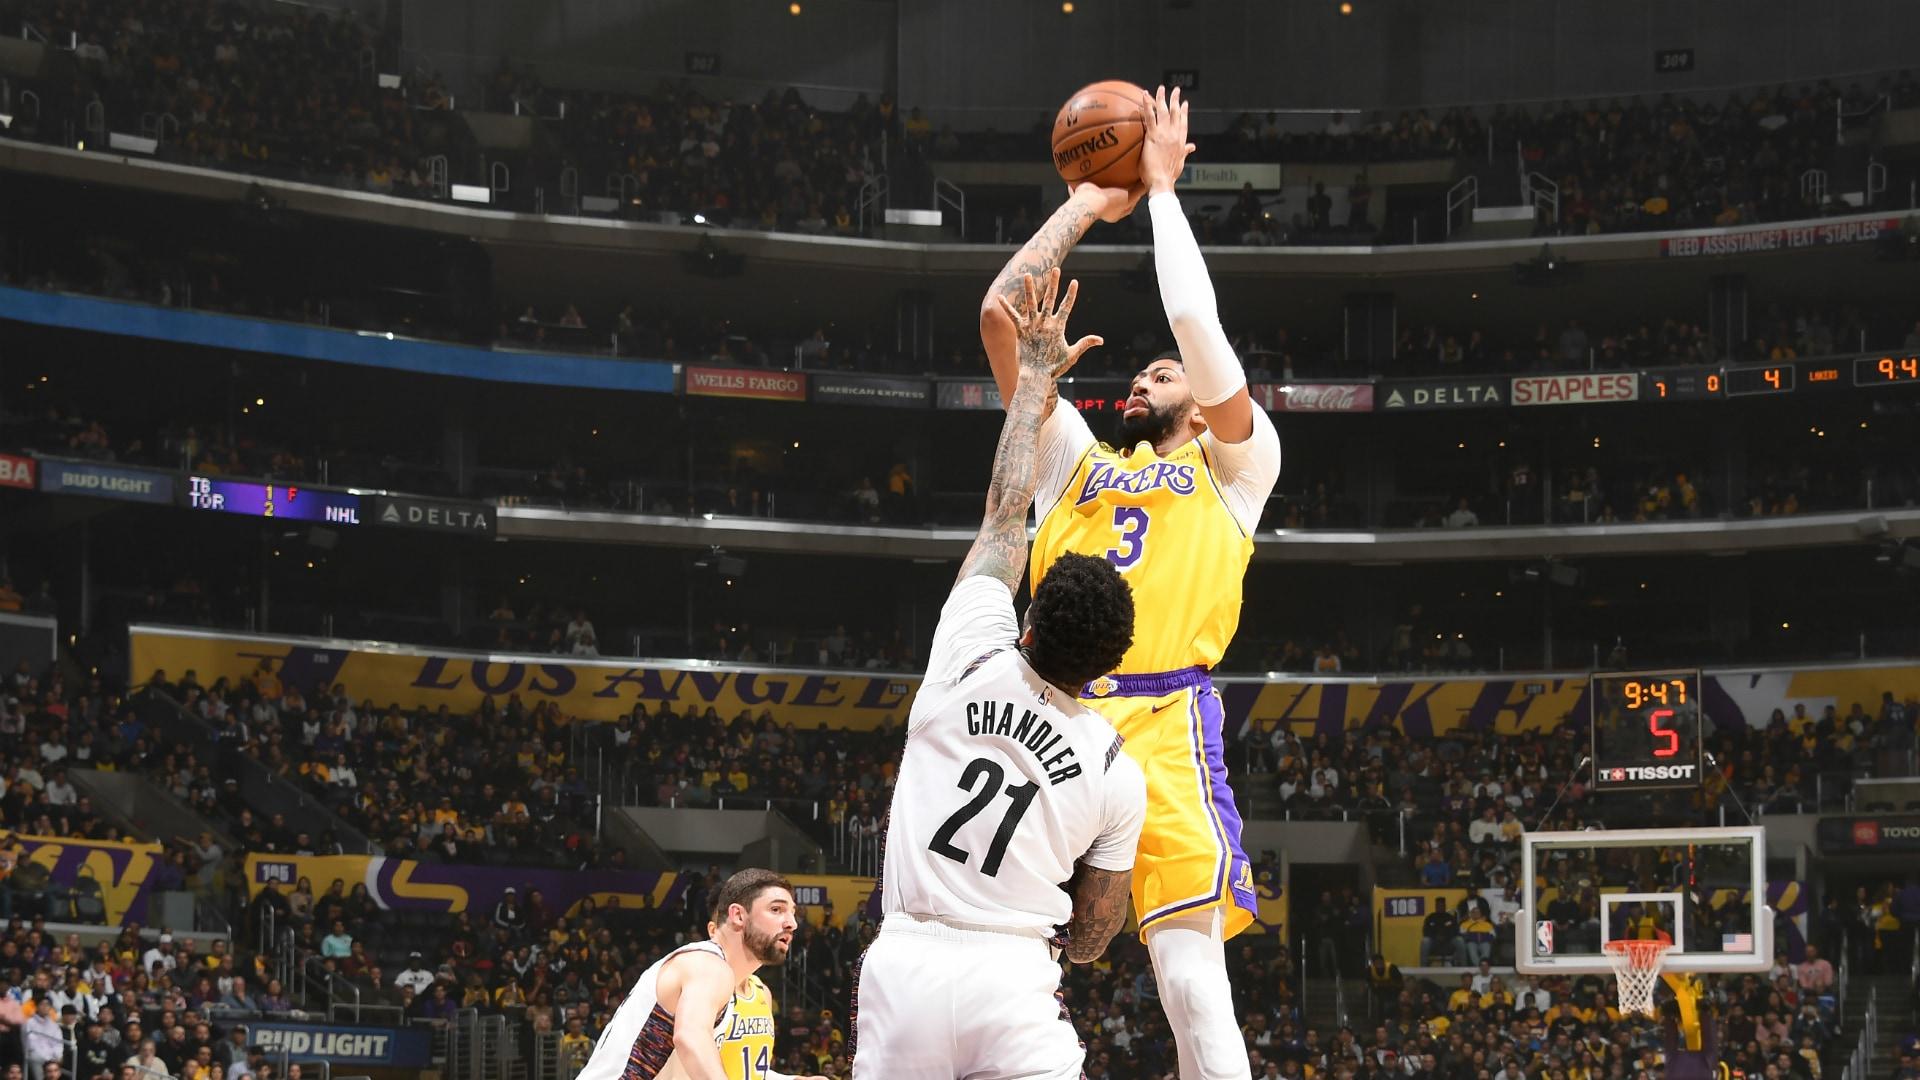 Nets @ Lakers